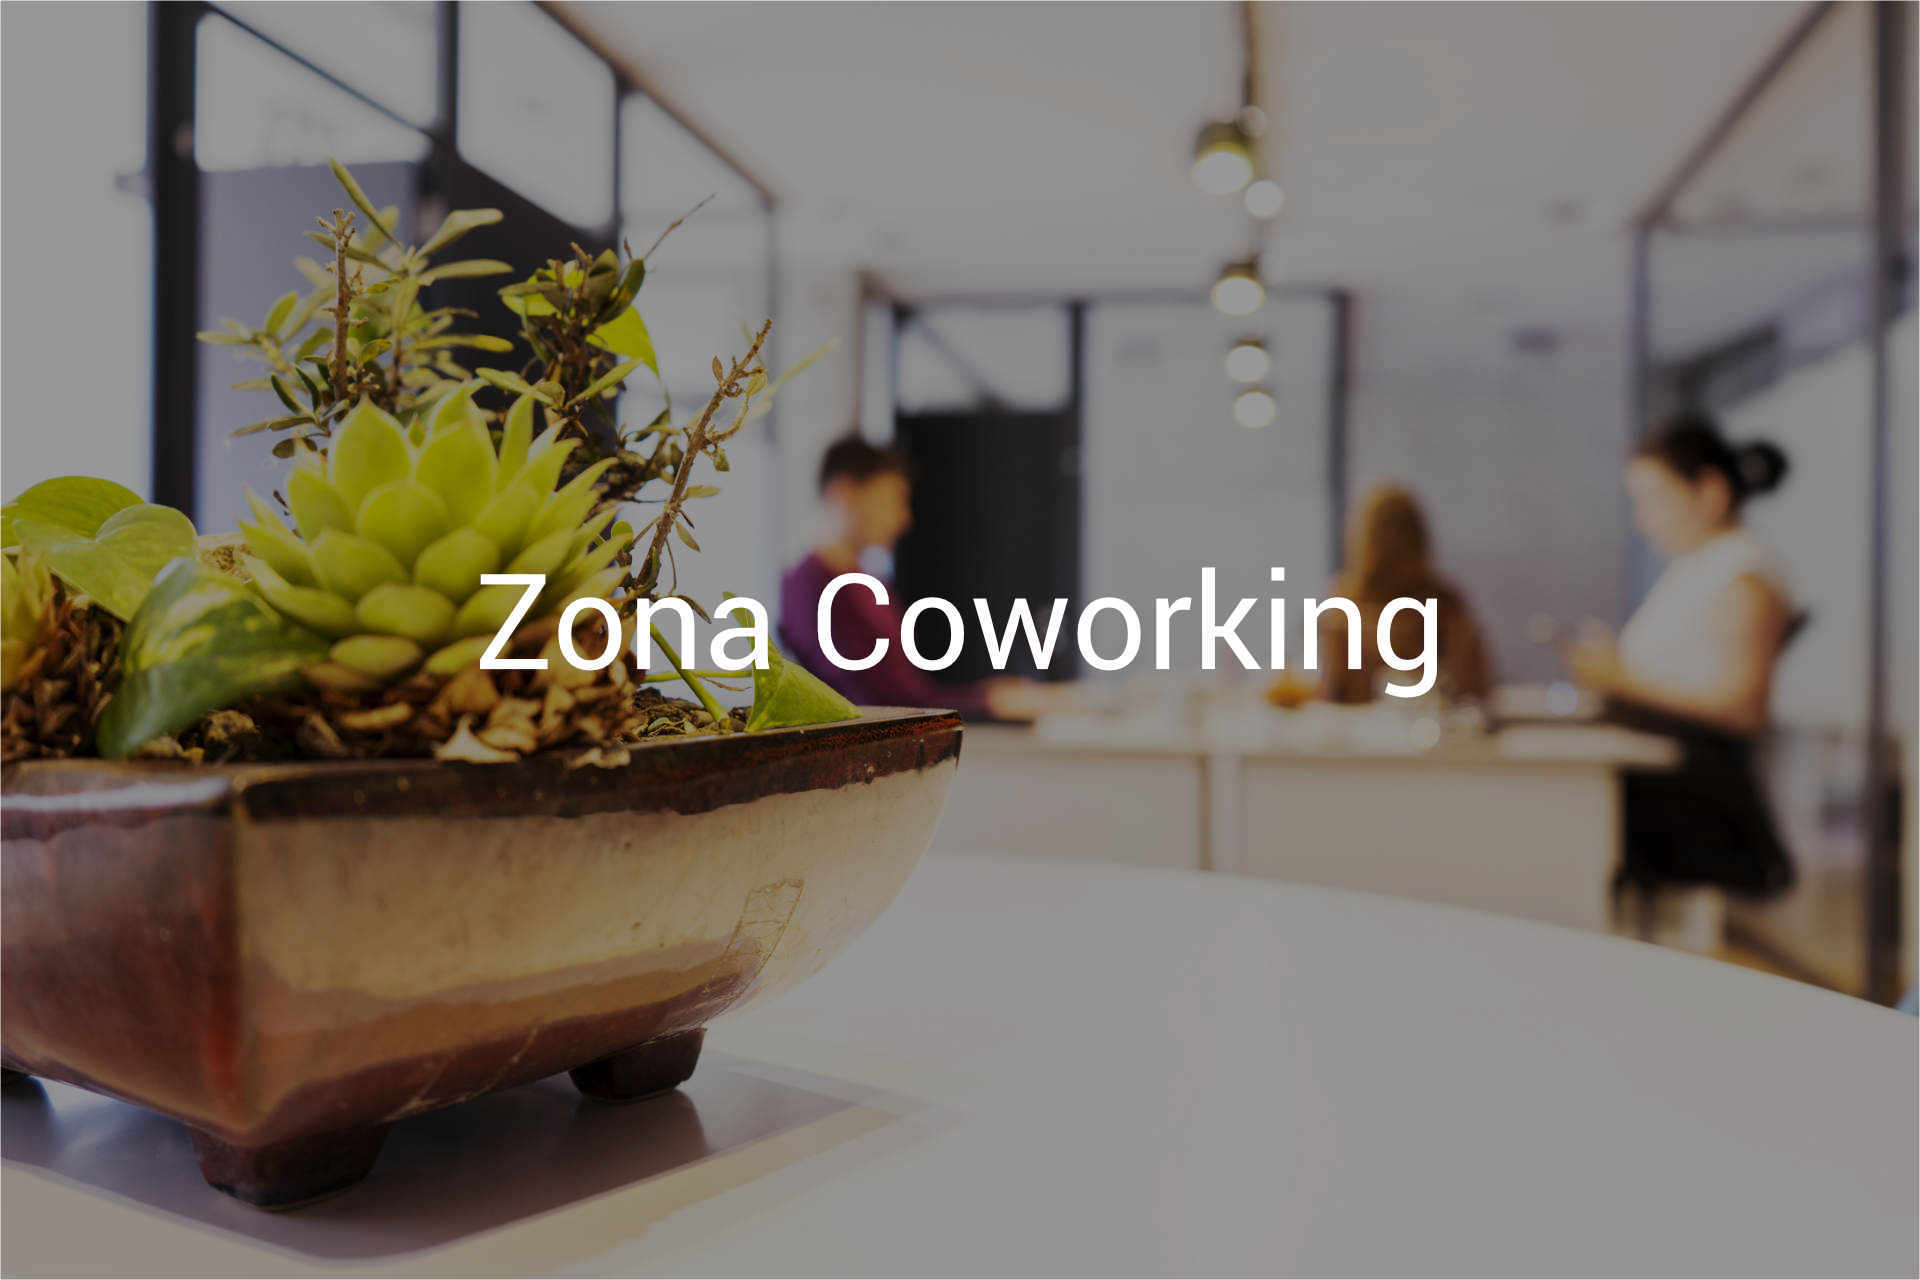 Zona-Coworking-inCUBE-Espacios